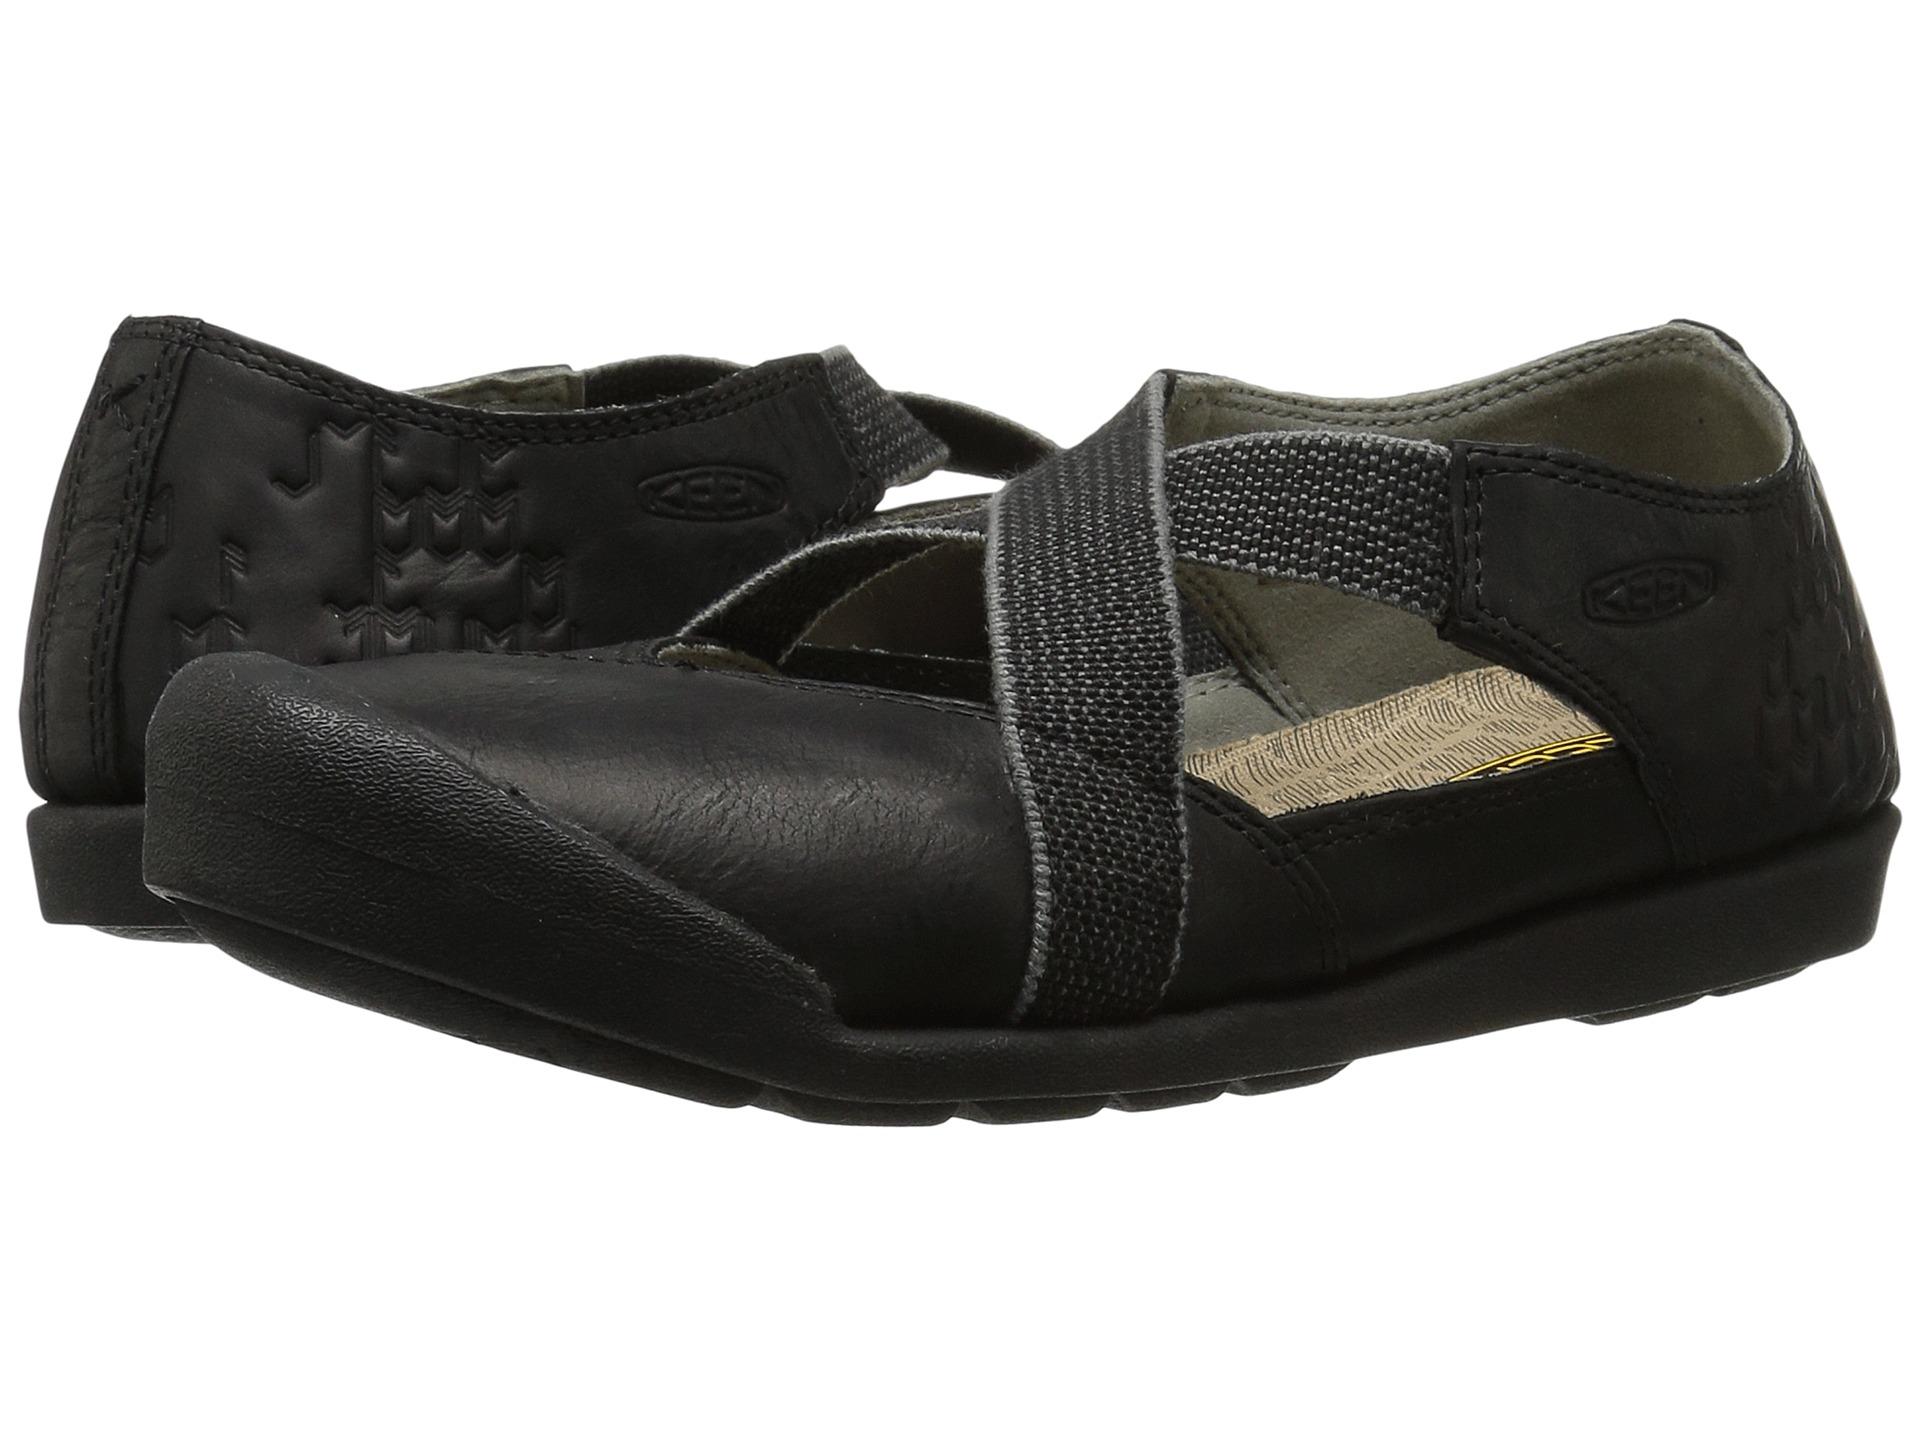 Keen Shoes Women Mj